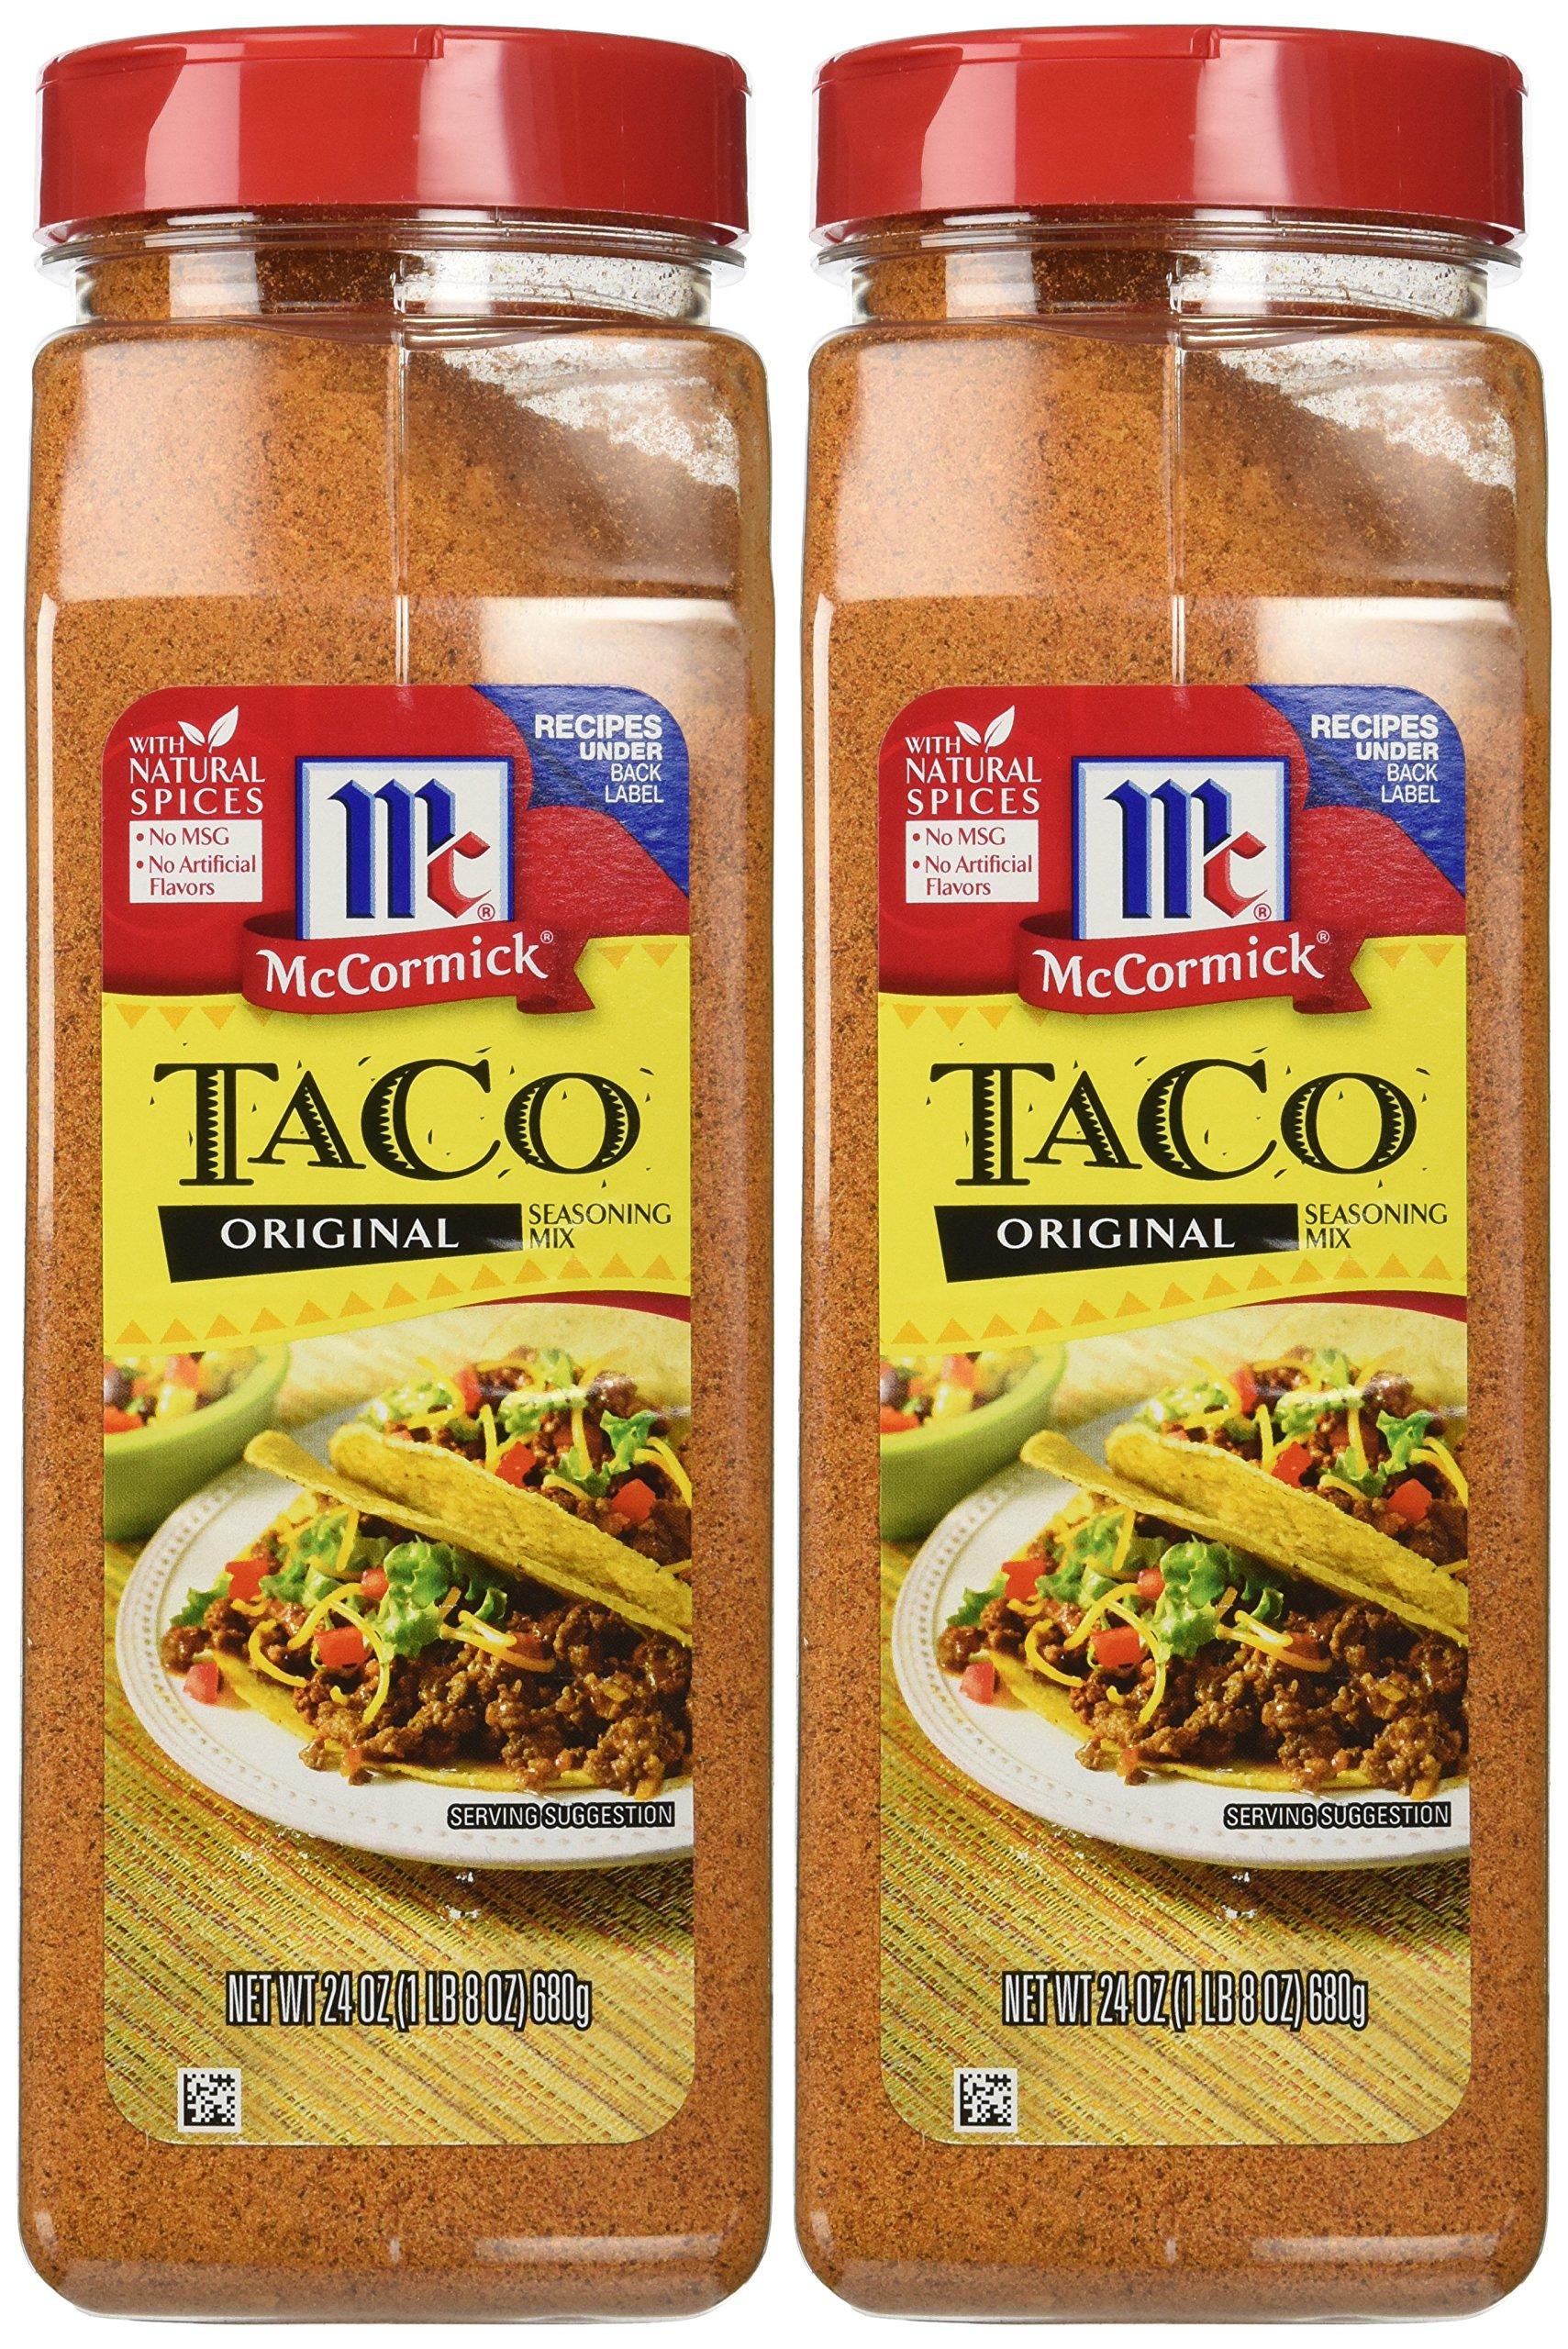 Mccormick Original Taco Seasoning Mix 680g Tub Buy Online In Belize At Belize Desertcart Com Productid 50211316